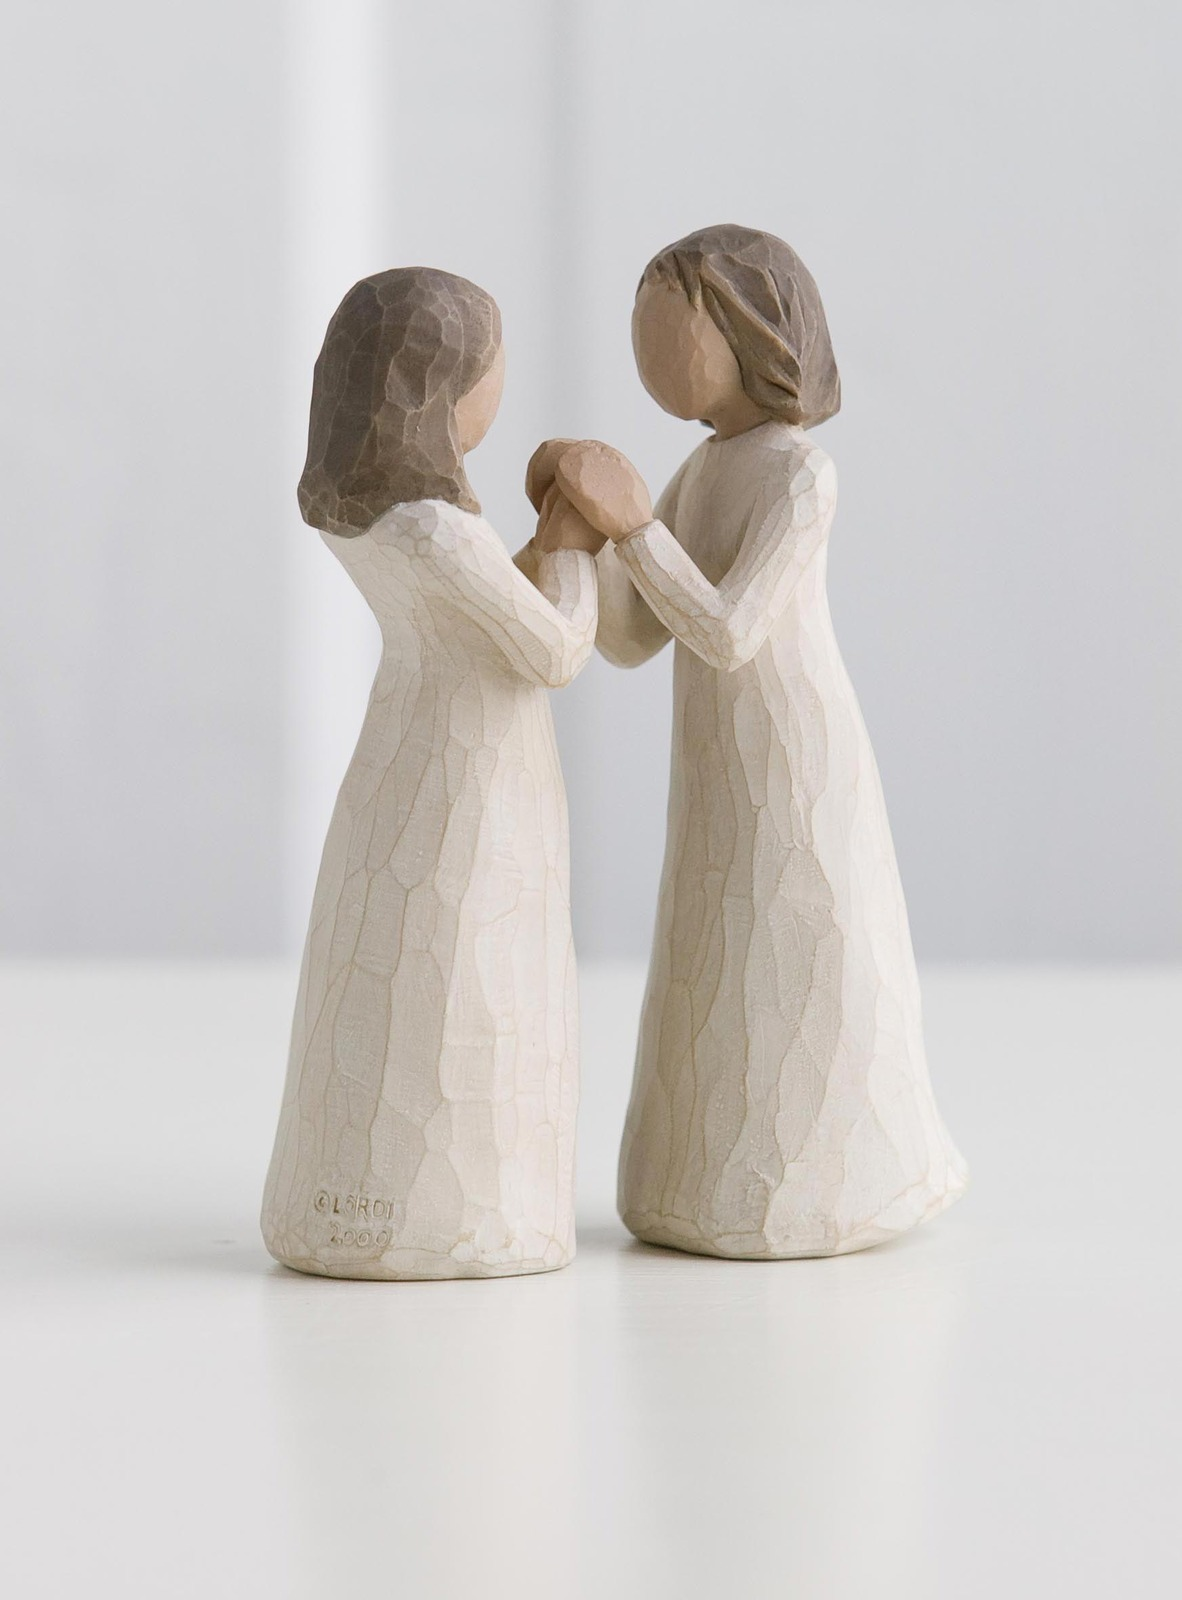 Friendship Glass Figurines